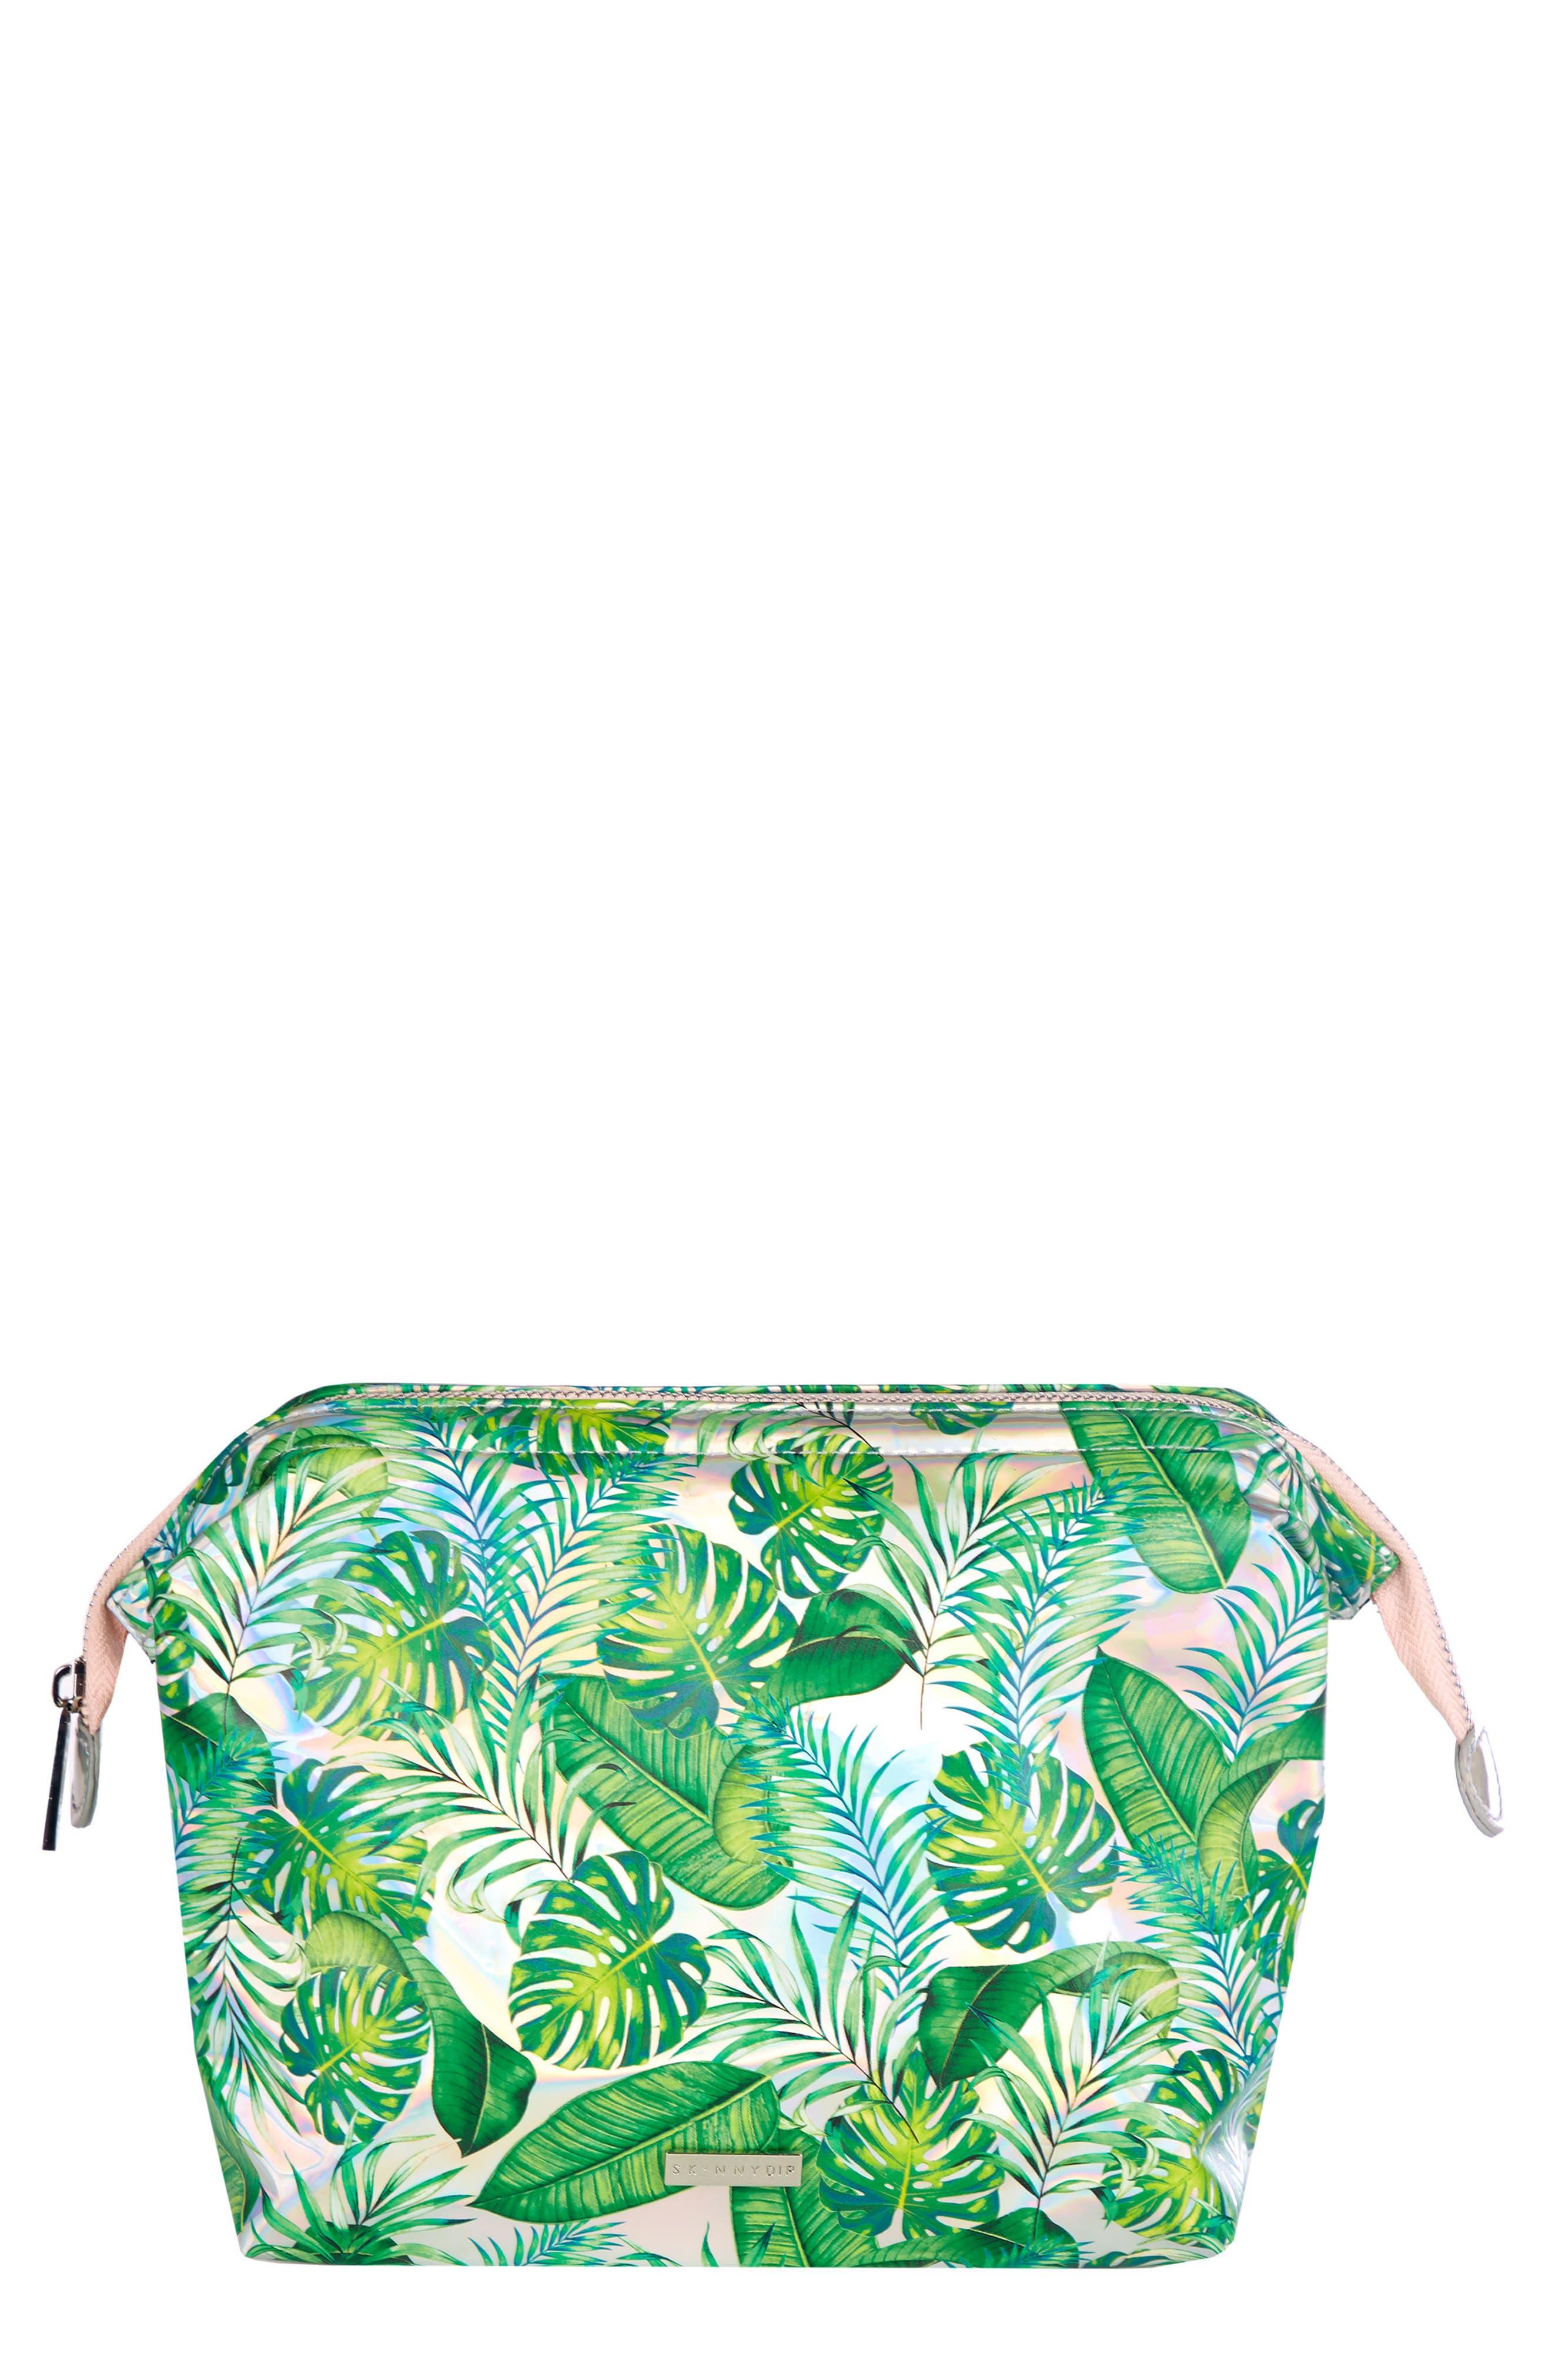 Skinny Dip Dominica Large Cosmetics Case,                         Main,                         color, 000